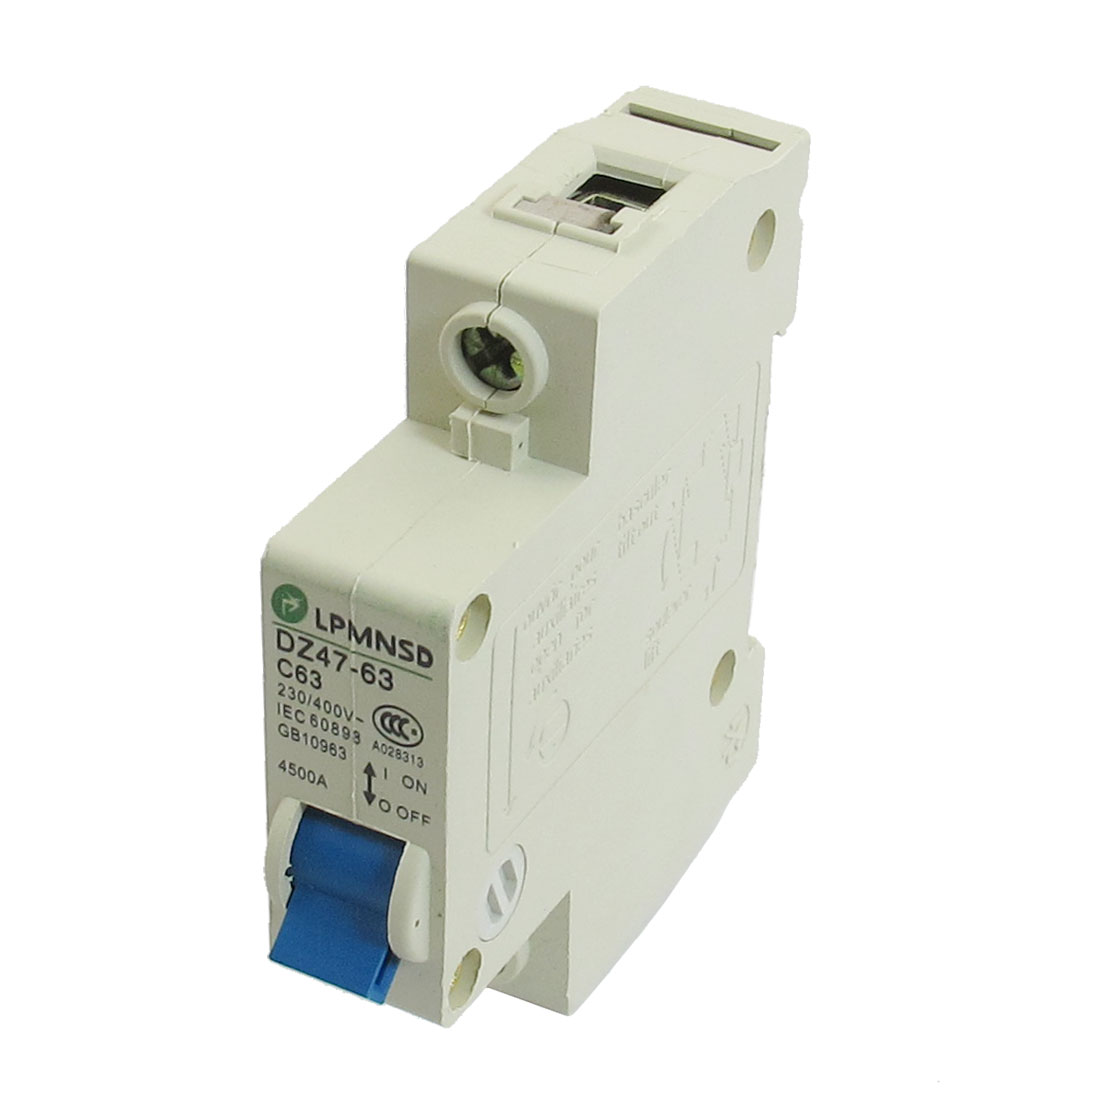 DZ47-63 C63 63A 230/400VAC 4500A Breaking Capacity 1 Poles Circuit Breaker